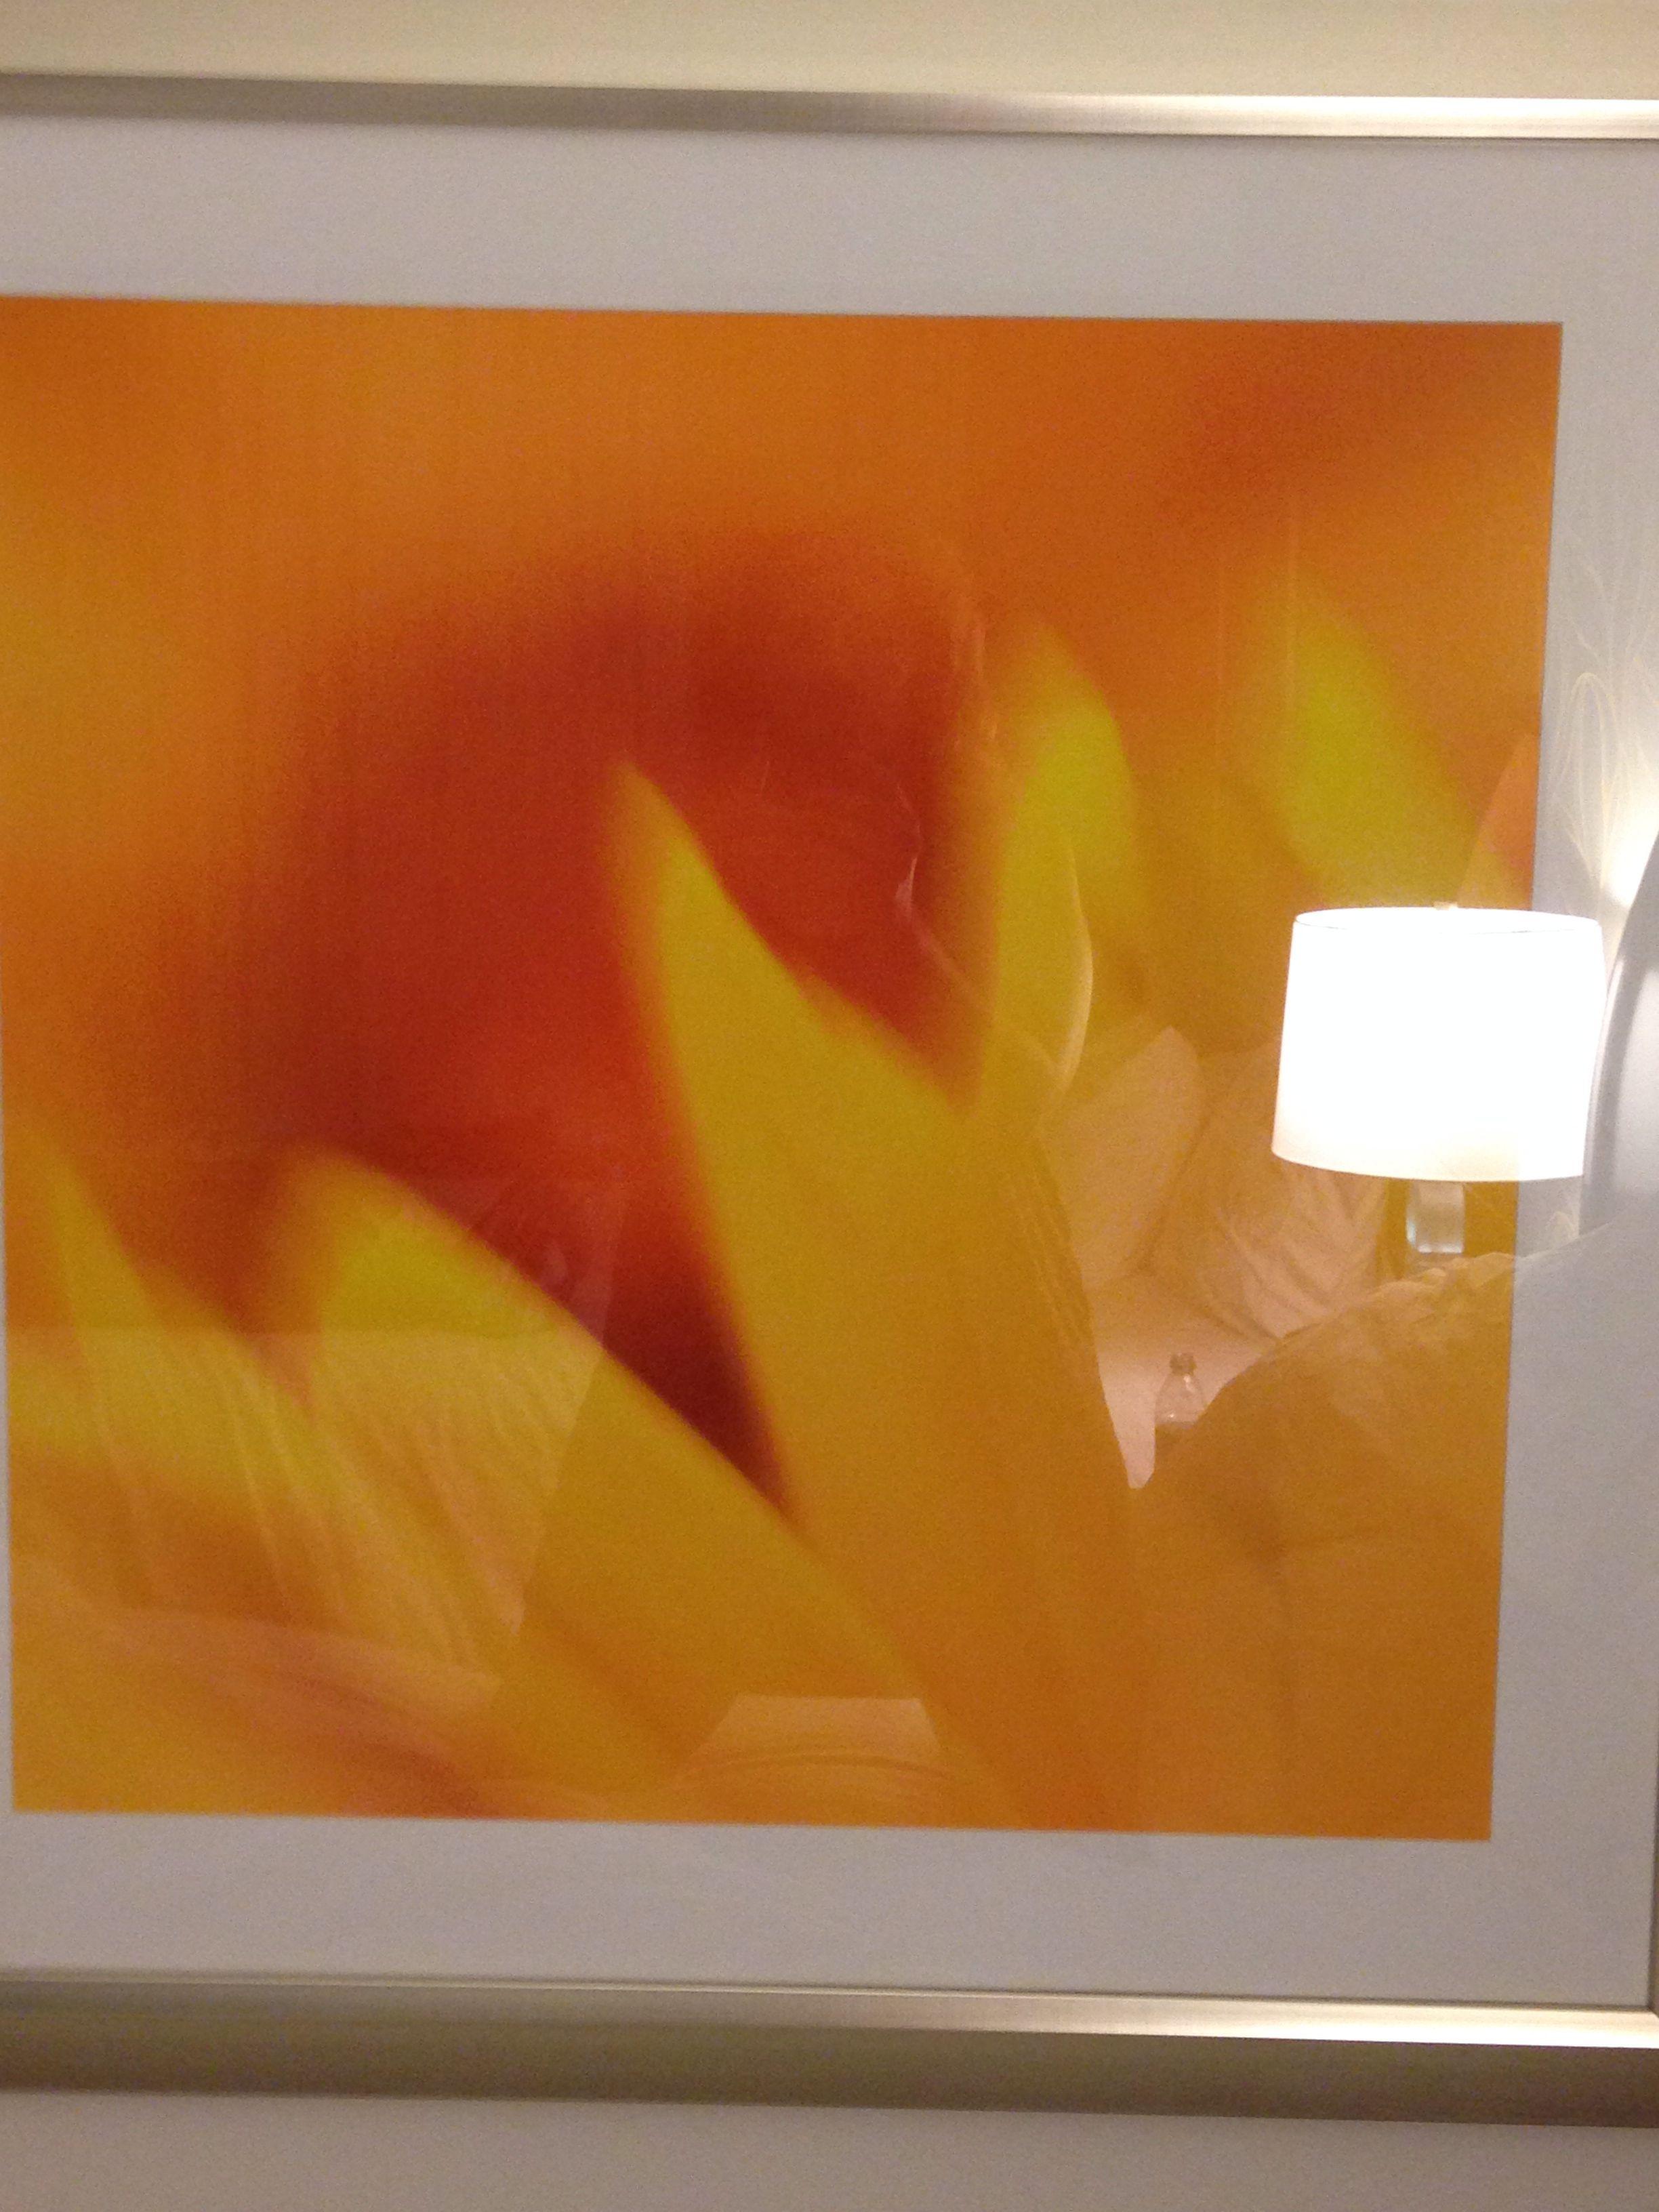 Think turquoise sky, orange/yellow sun, red petals.